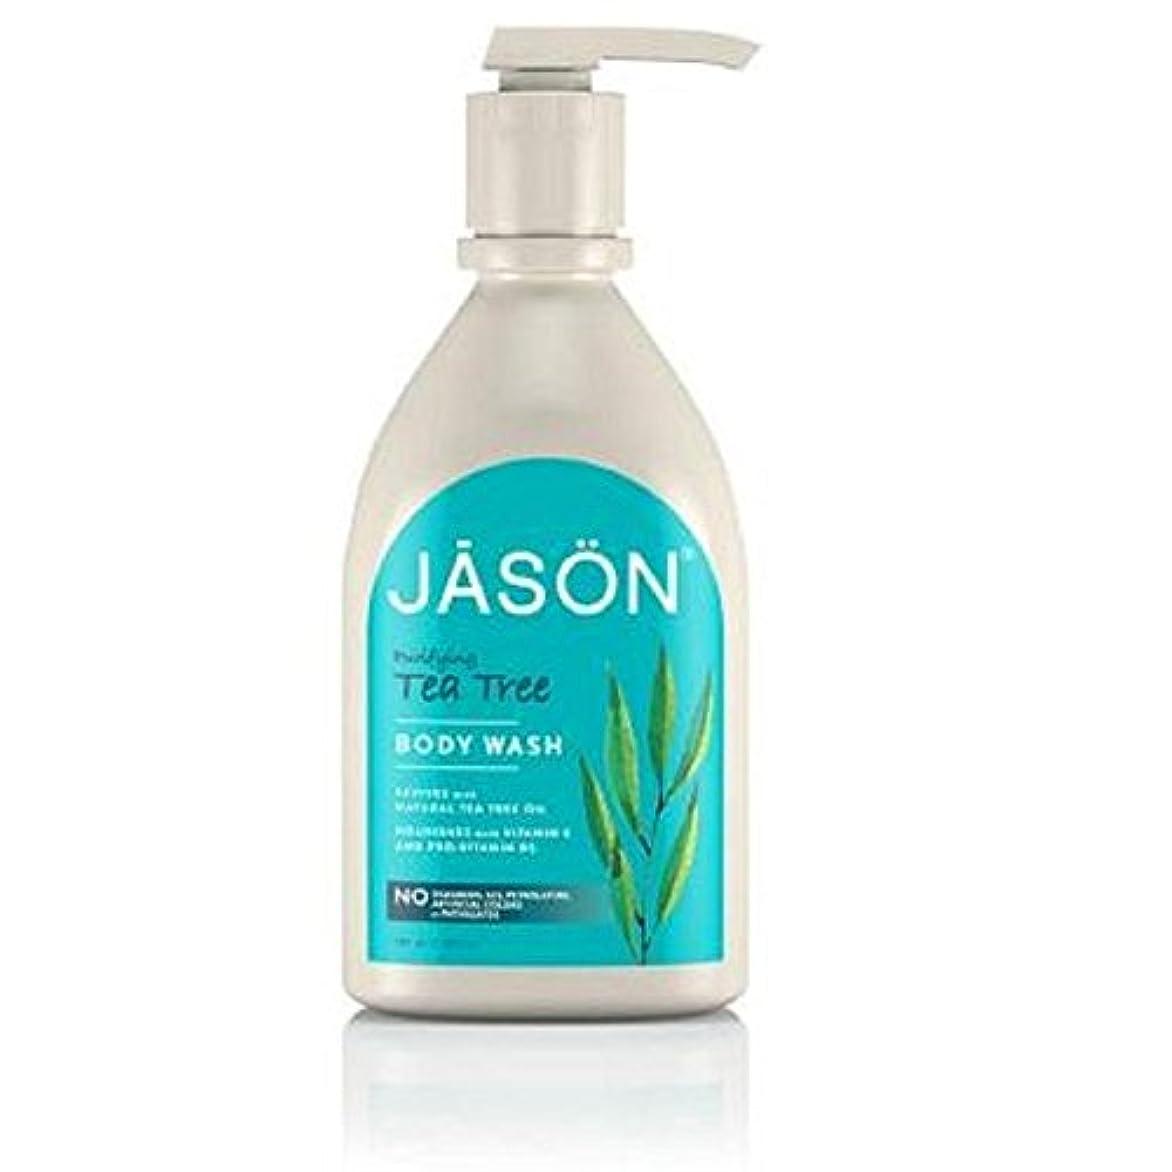 Jason Tea Tree Satin Body Wash Pump 900ml (Pack of 6) - ジェイソン?ティーツリーサテンボディウォッシュポンプ900ミリリットル x6 [並行輸入品]